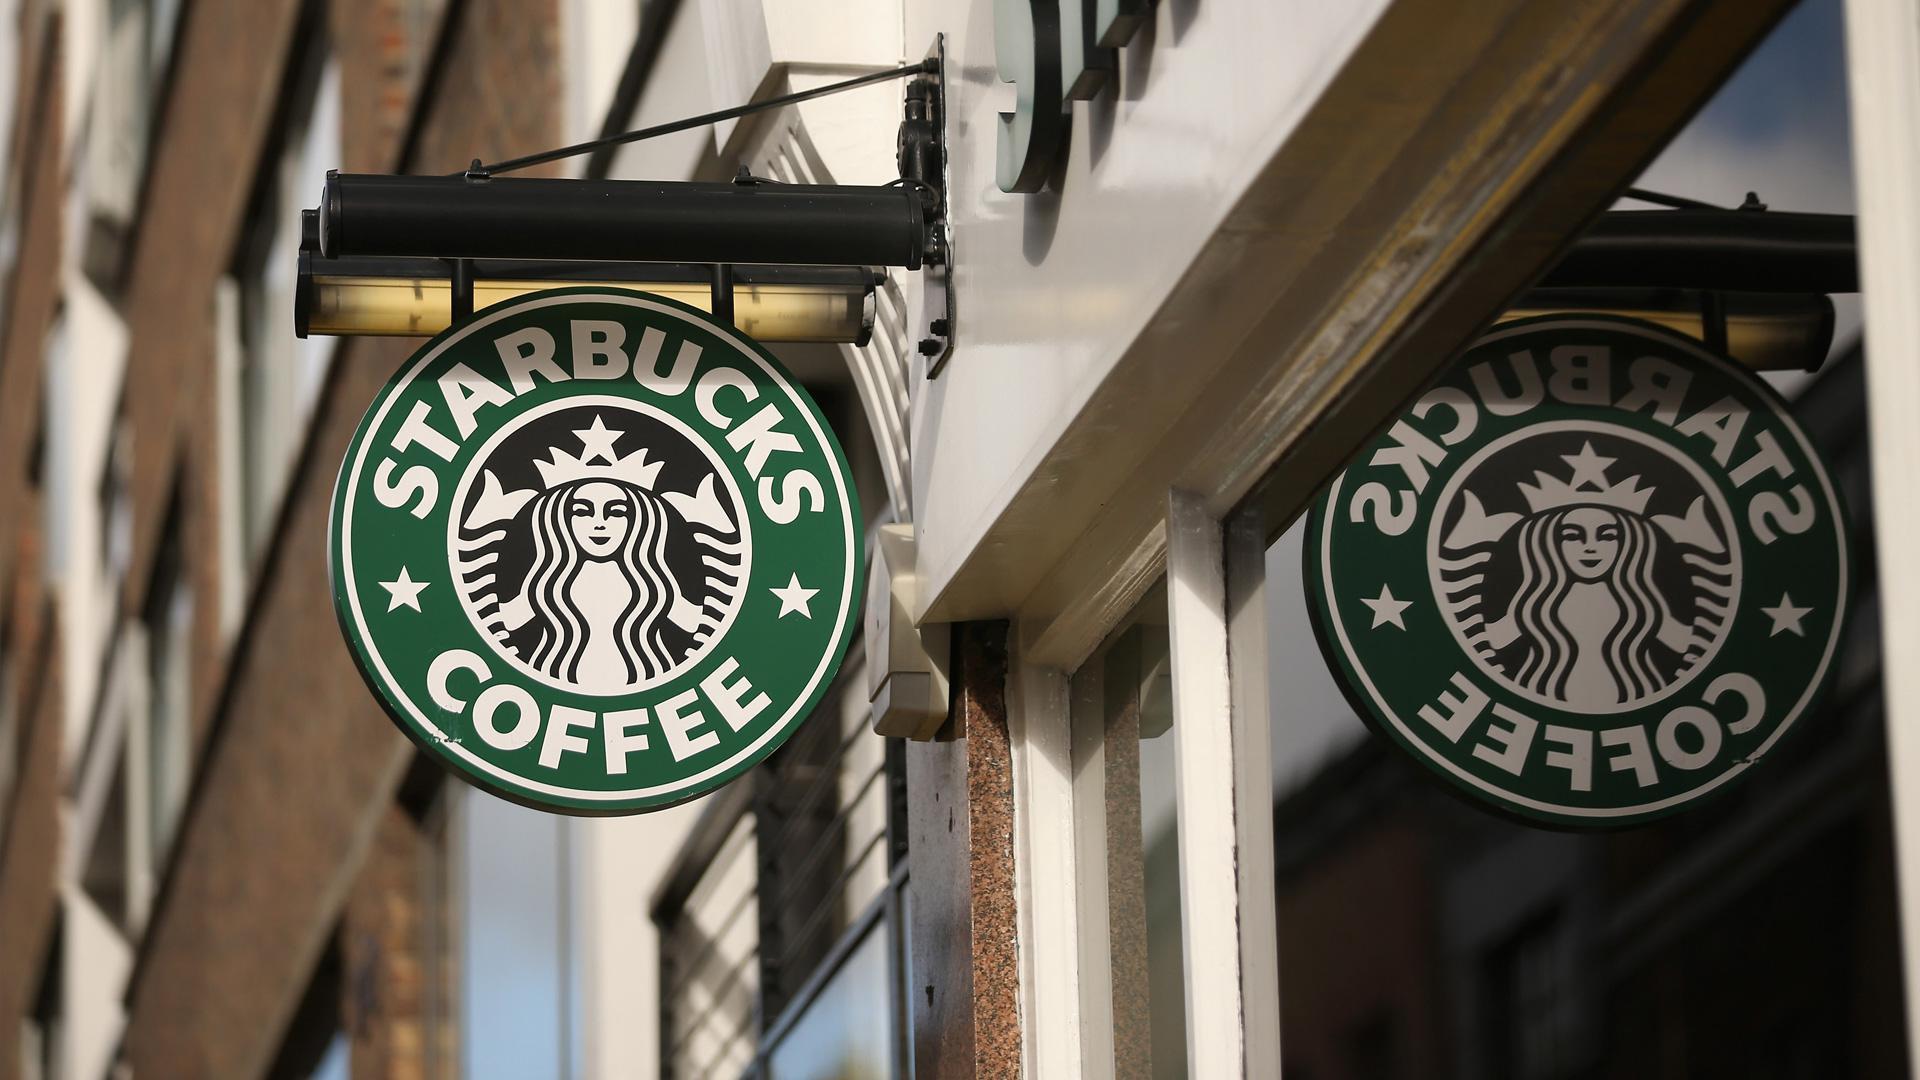 StarbucksOrganic.jpeg